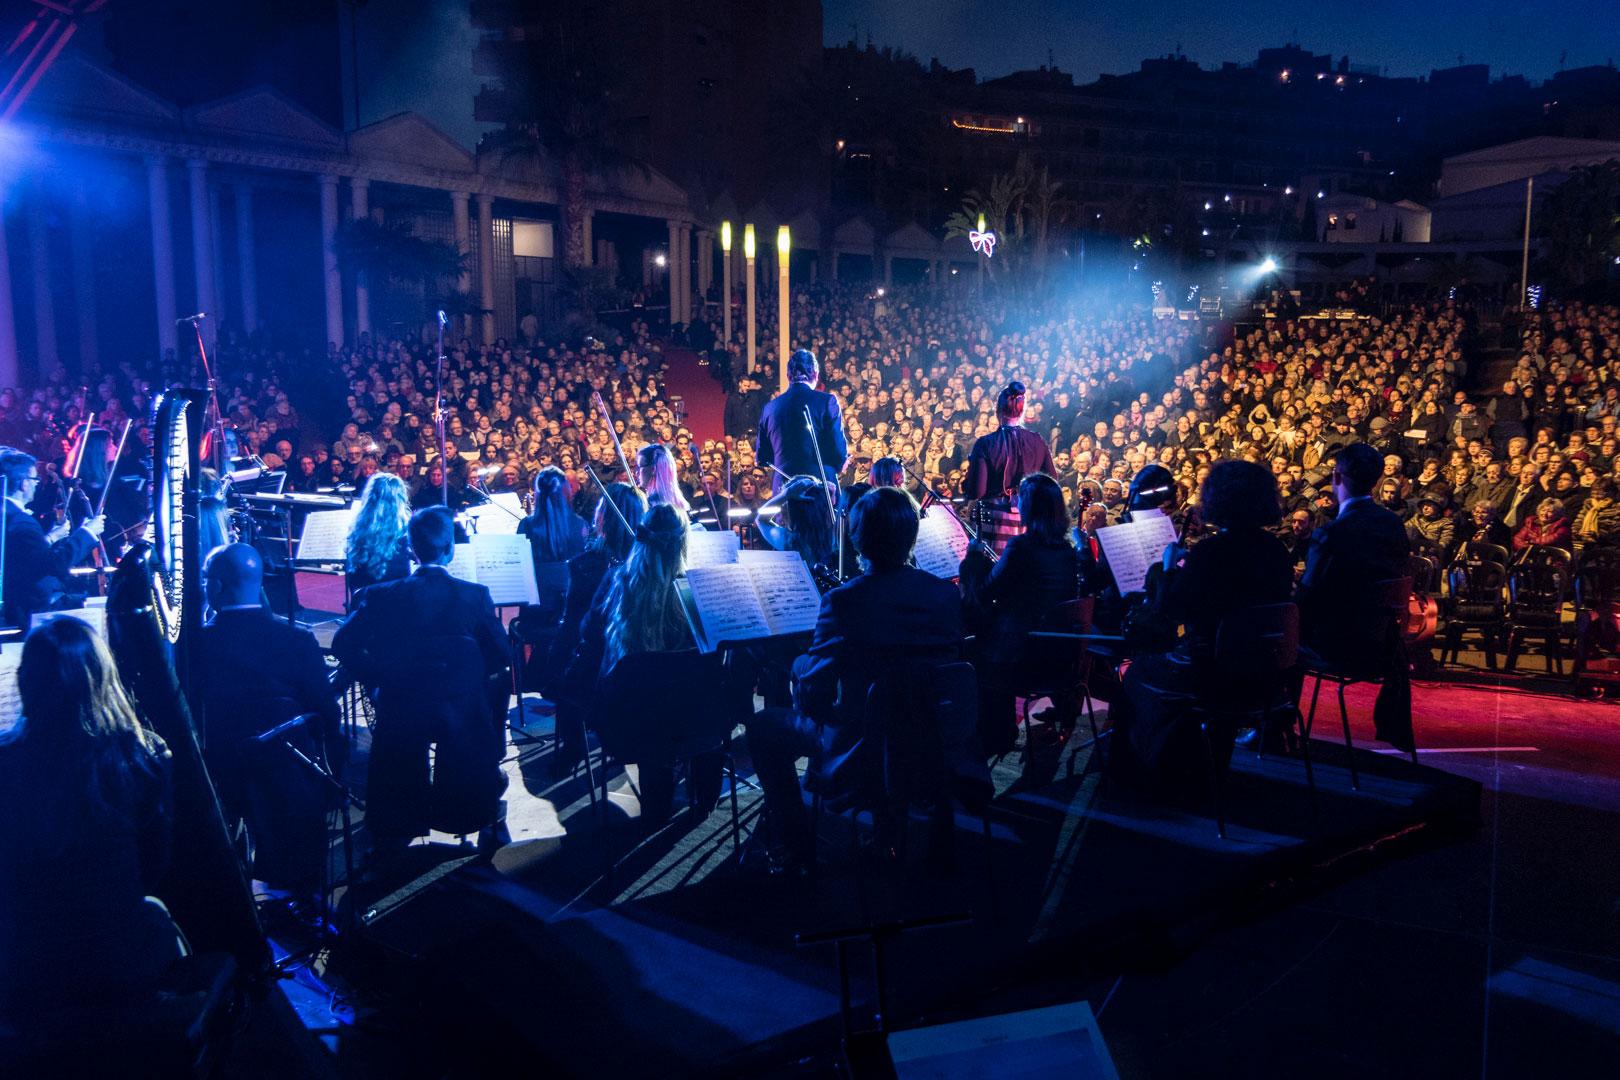 costa-blanca-event-photographer-live-concert-photo